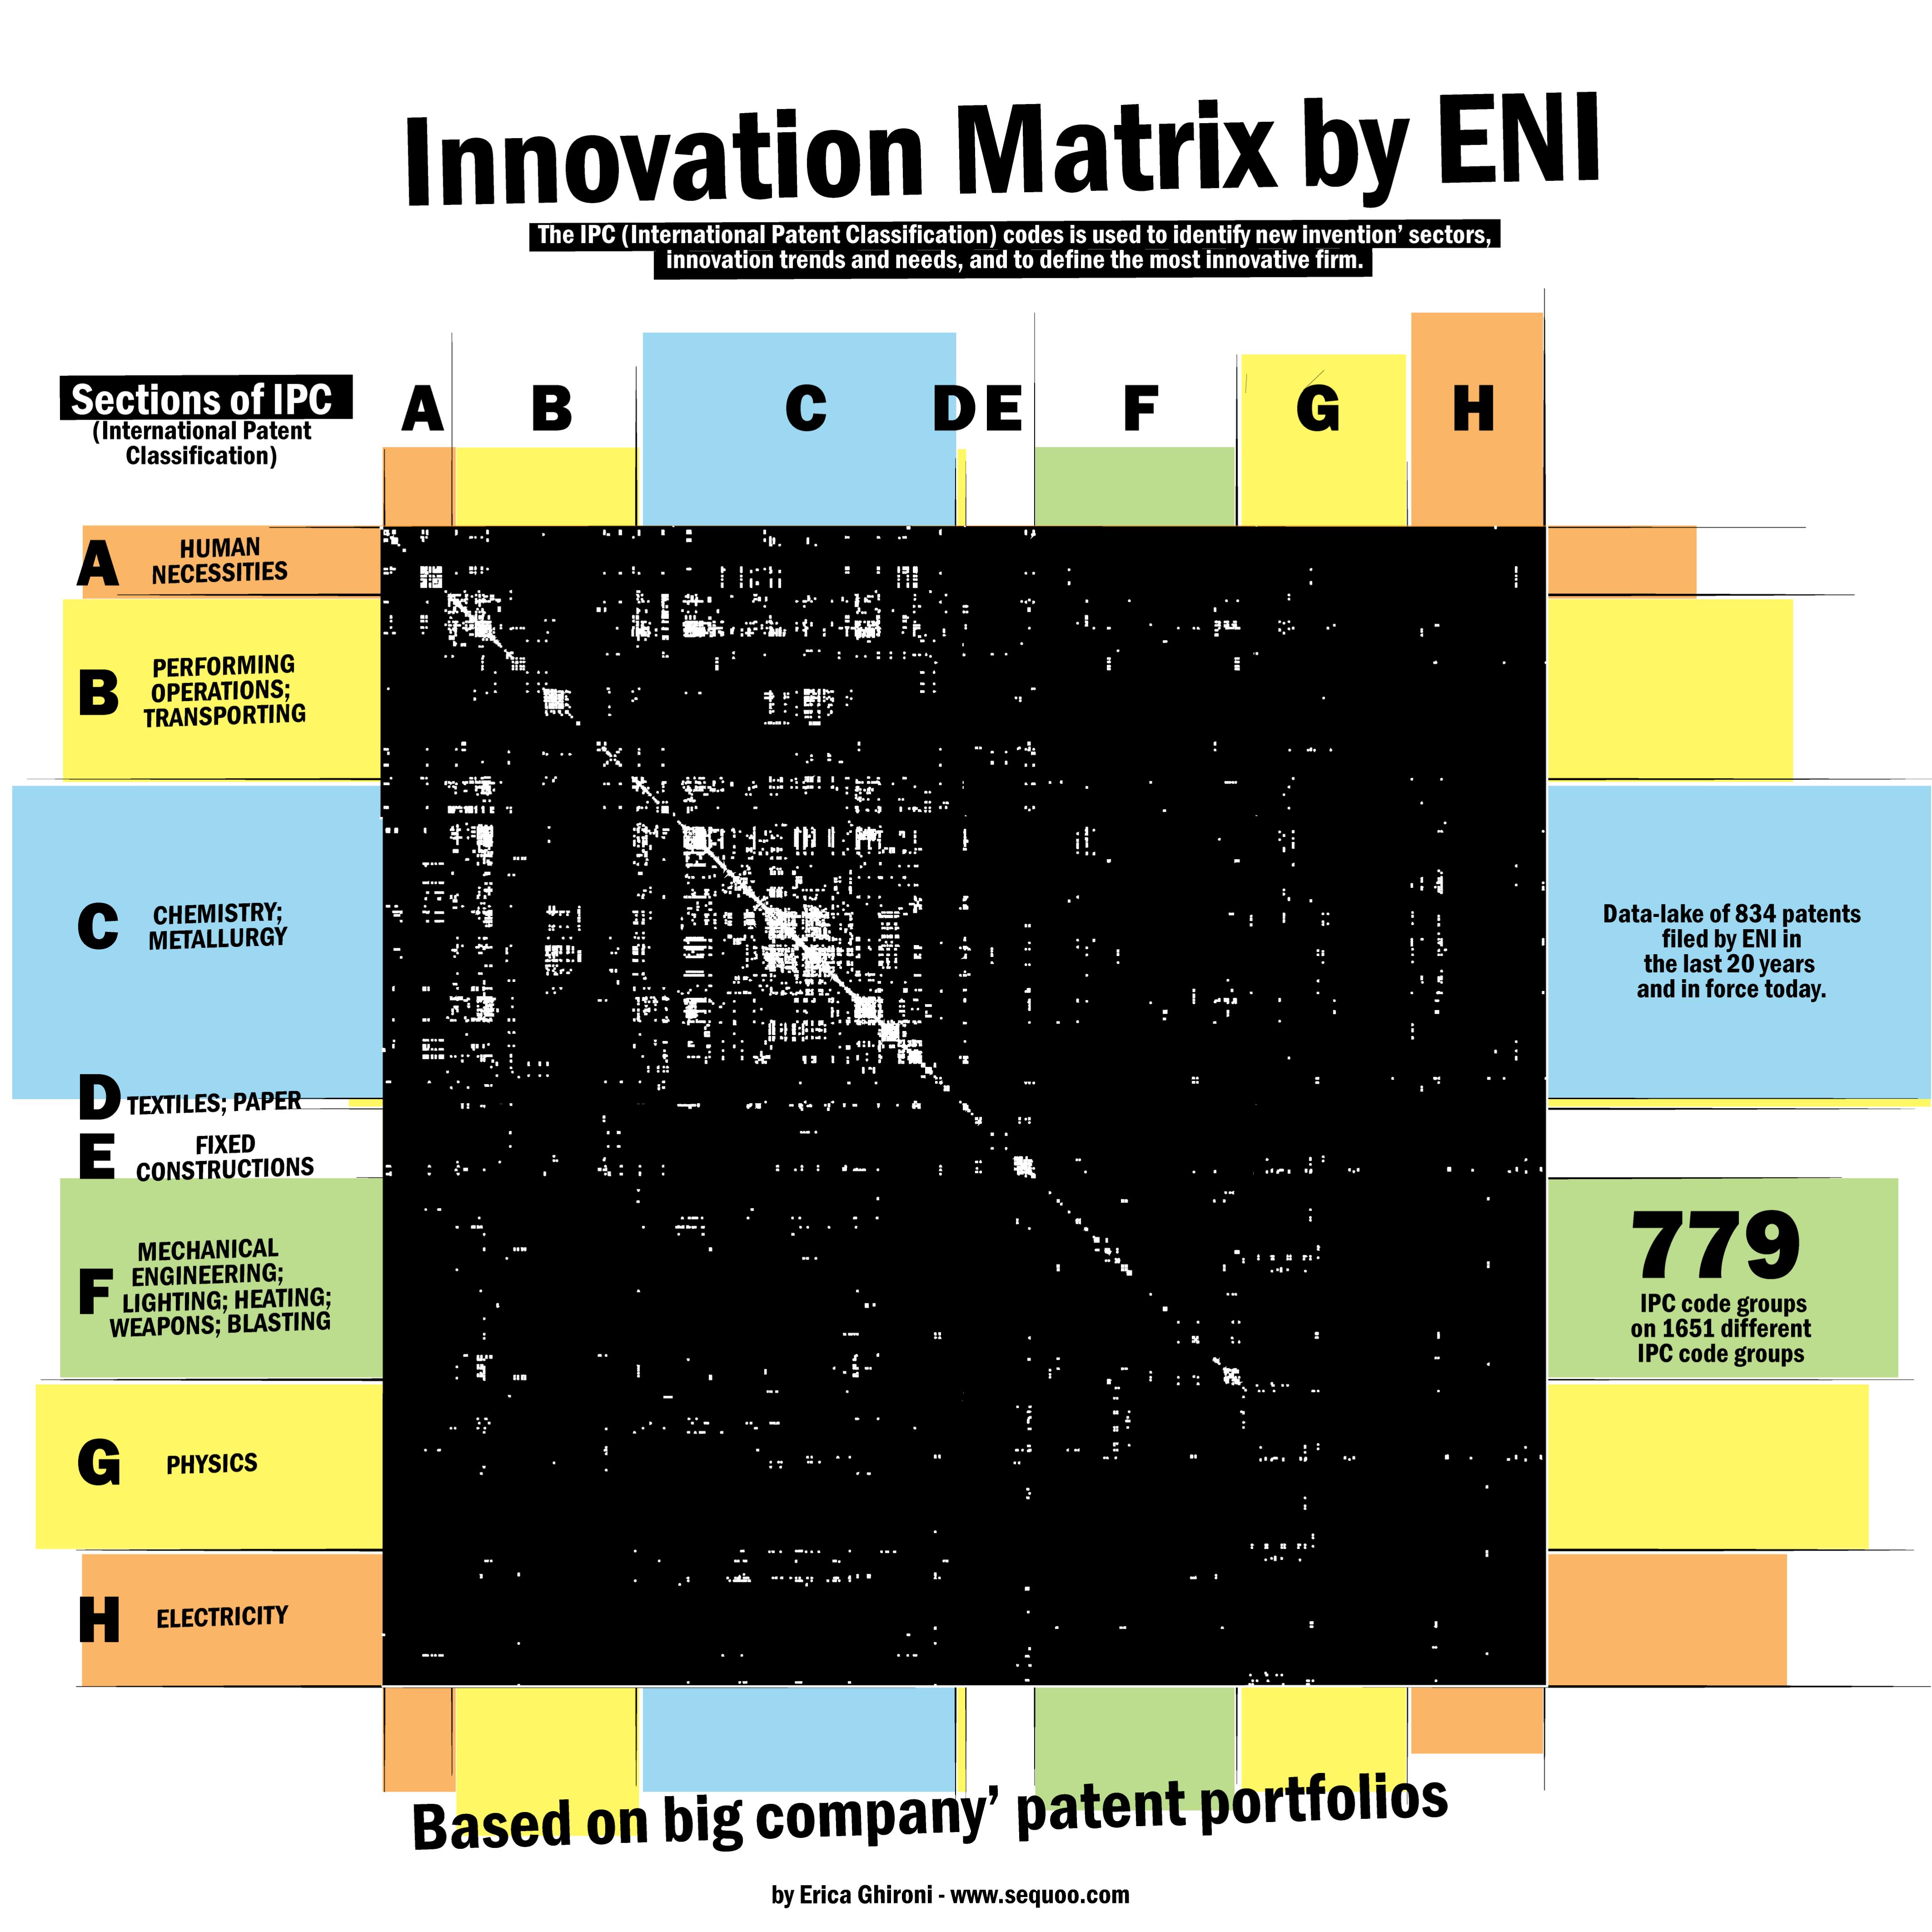 patent portfolio by ENI